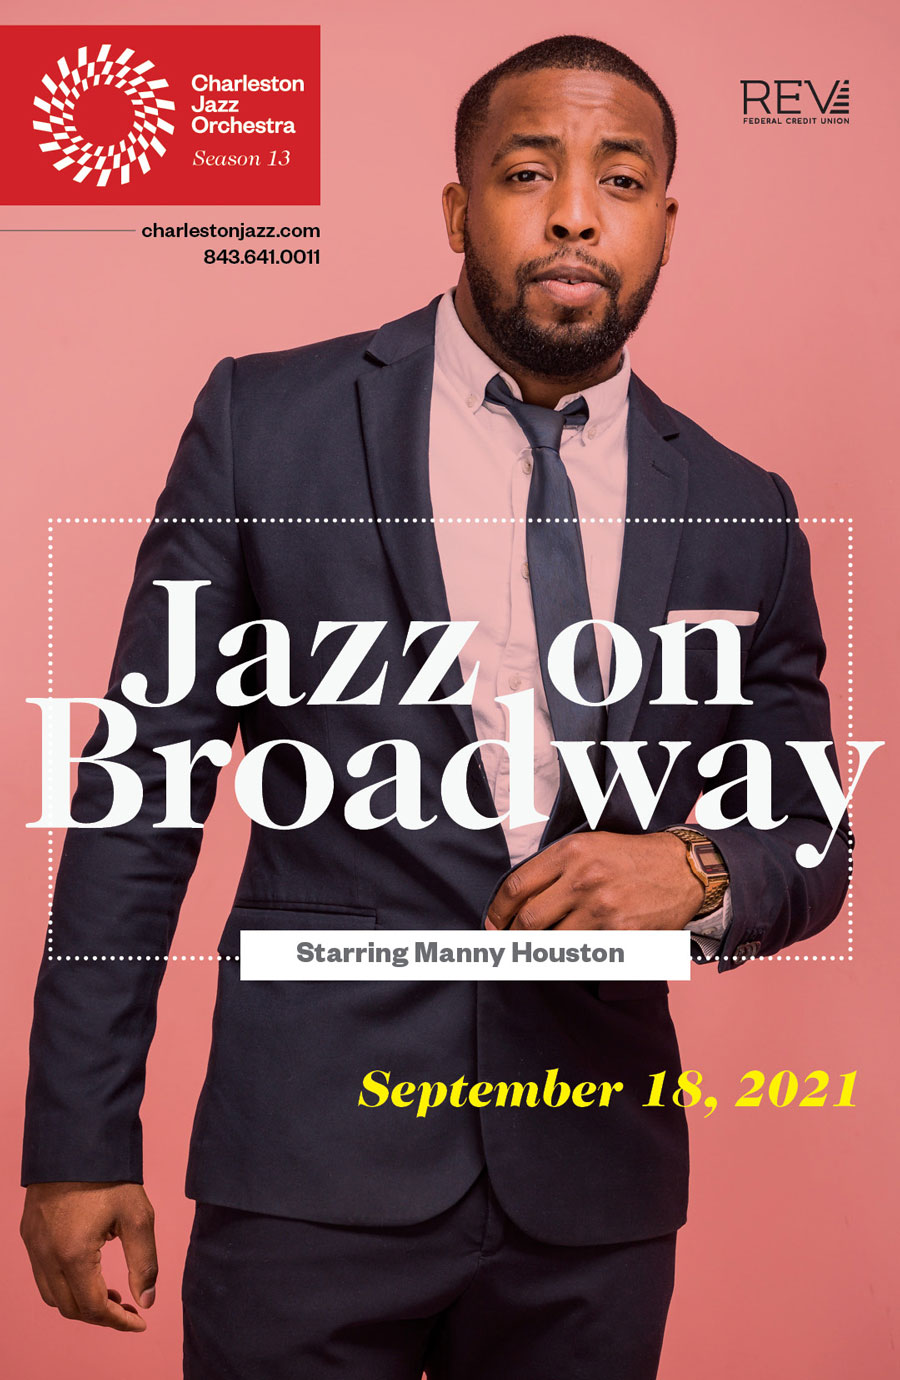 Jazz on Broadway Poster